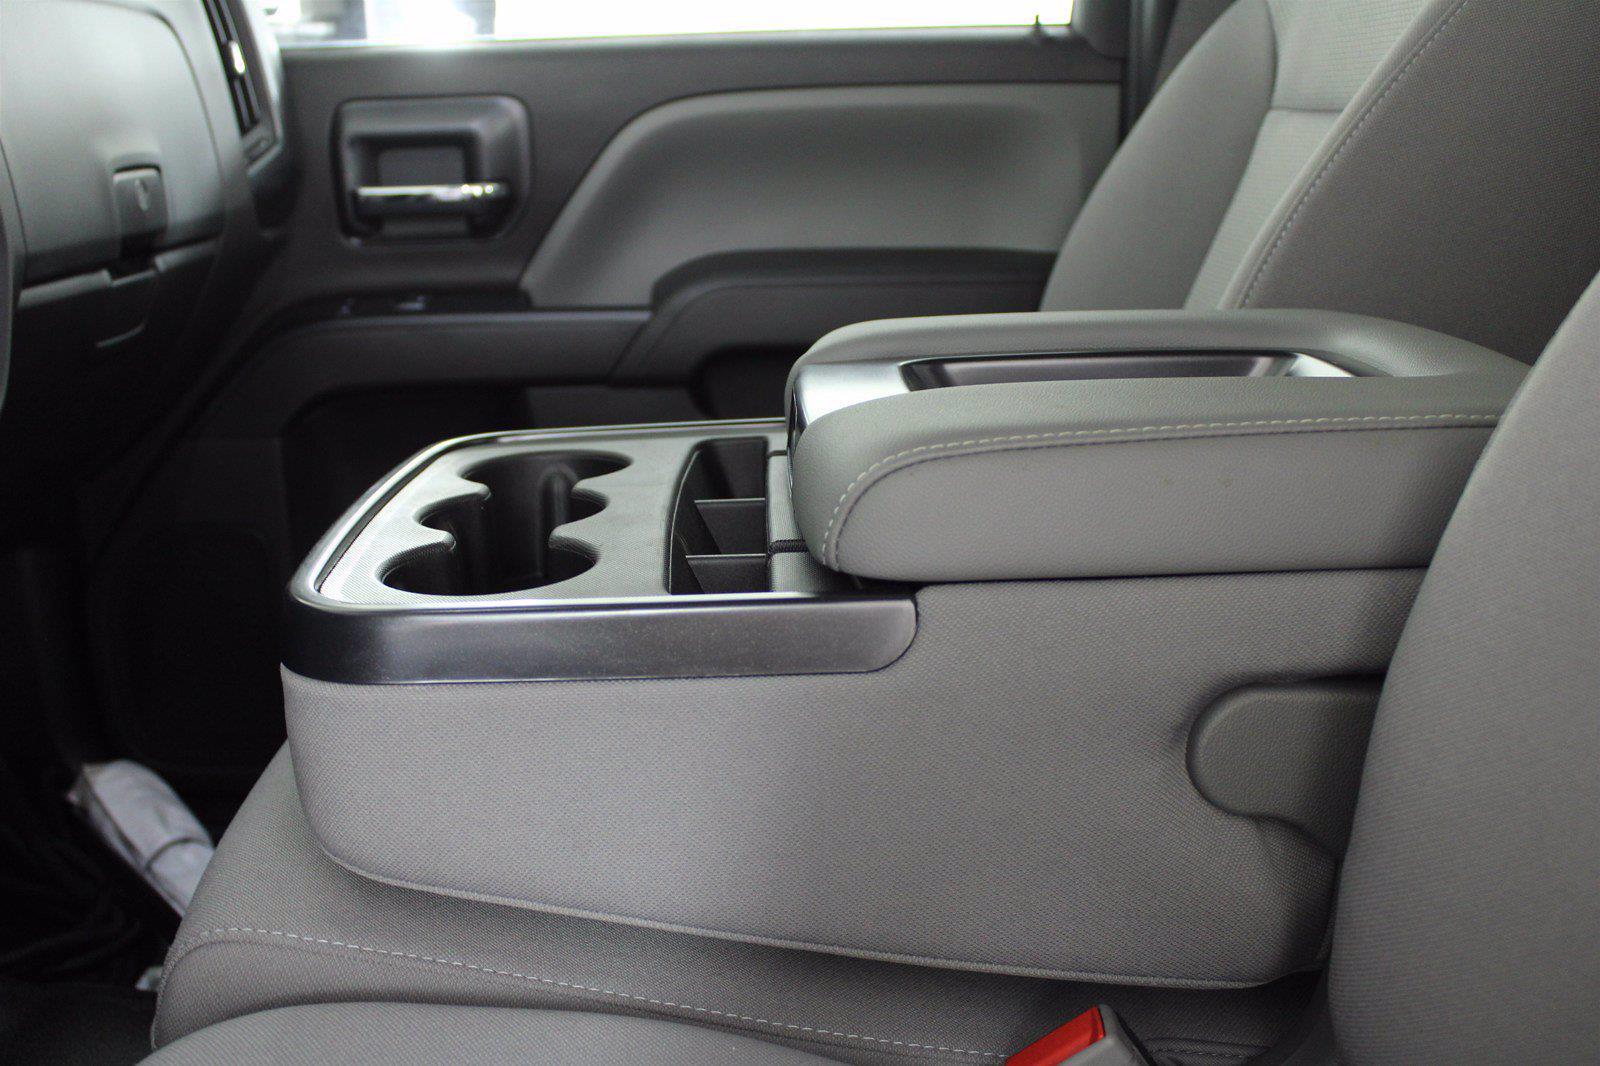 2019 Chevrolet Silverado 5500 DRW 4x2, Cab Chassis #D191062 - photo 16